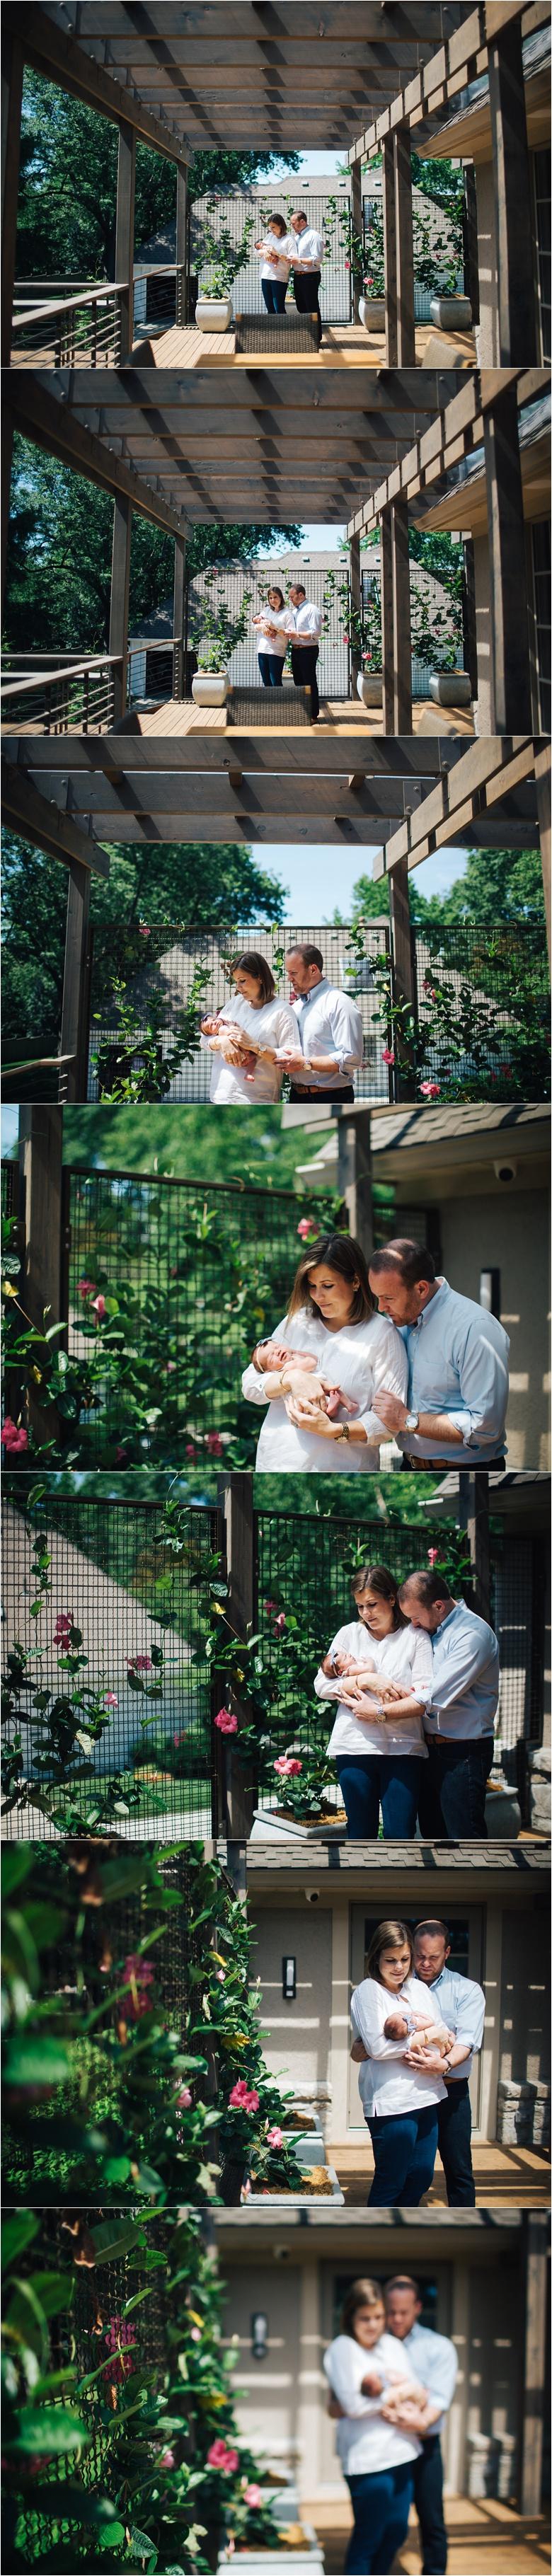 newbornphotographerkansascity_0013